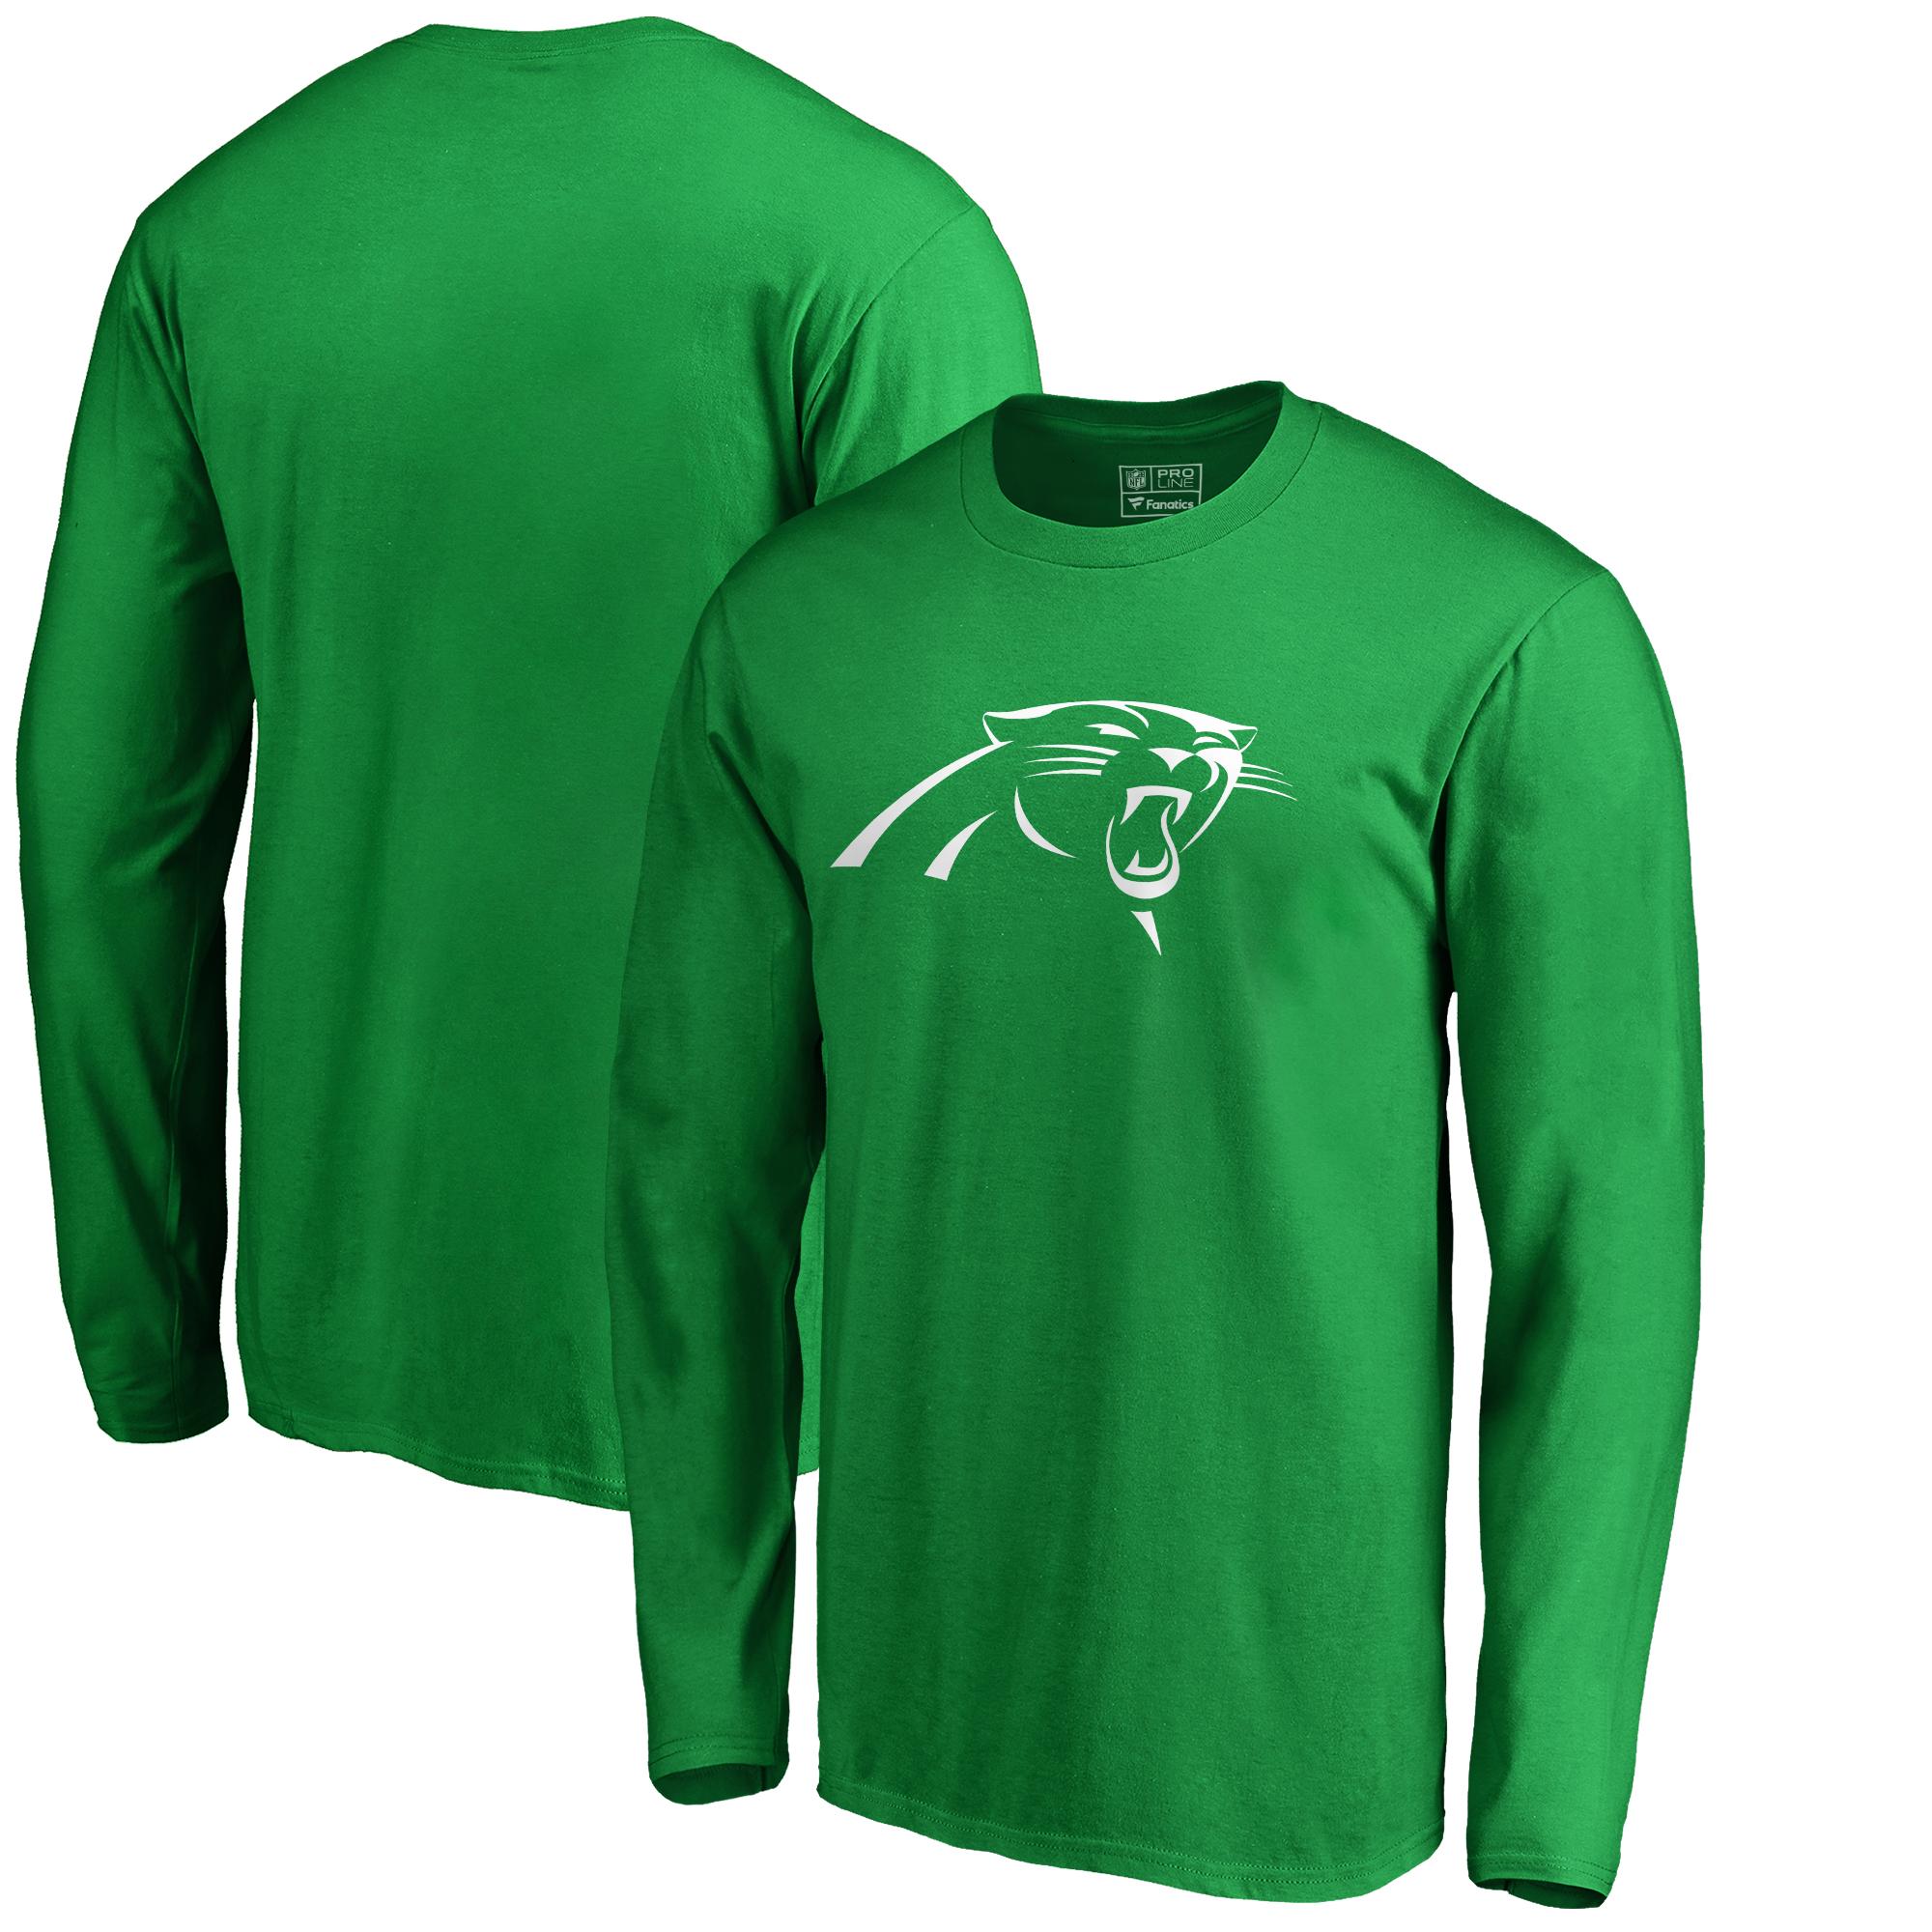 Carolina Panthers NFL Pro Line by Fanatics Branded St. Patrick's Day White Logo Long Sleeve T-Shirt - Kelly Green